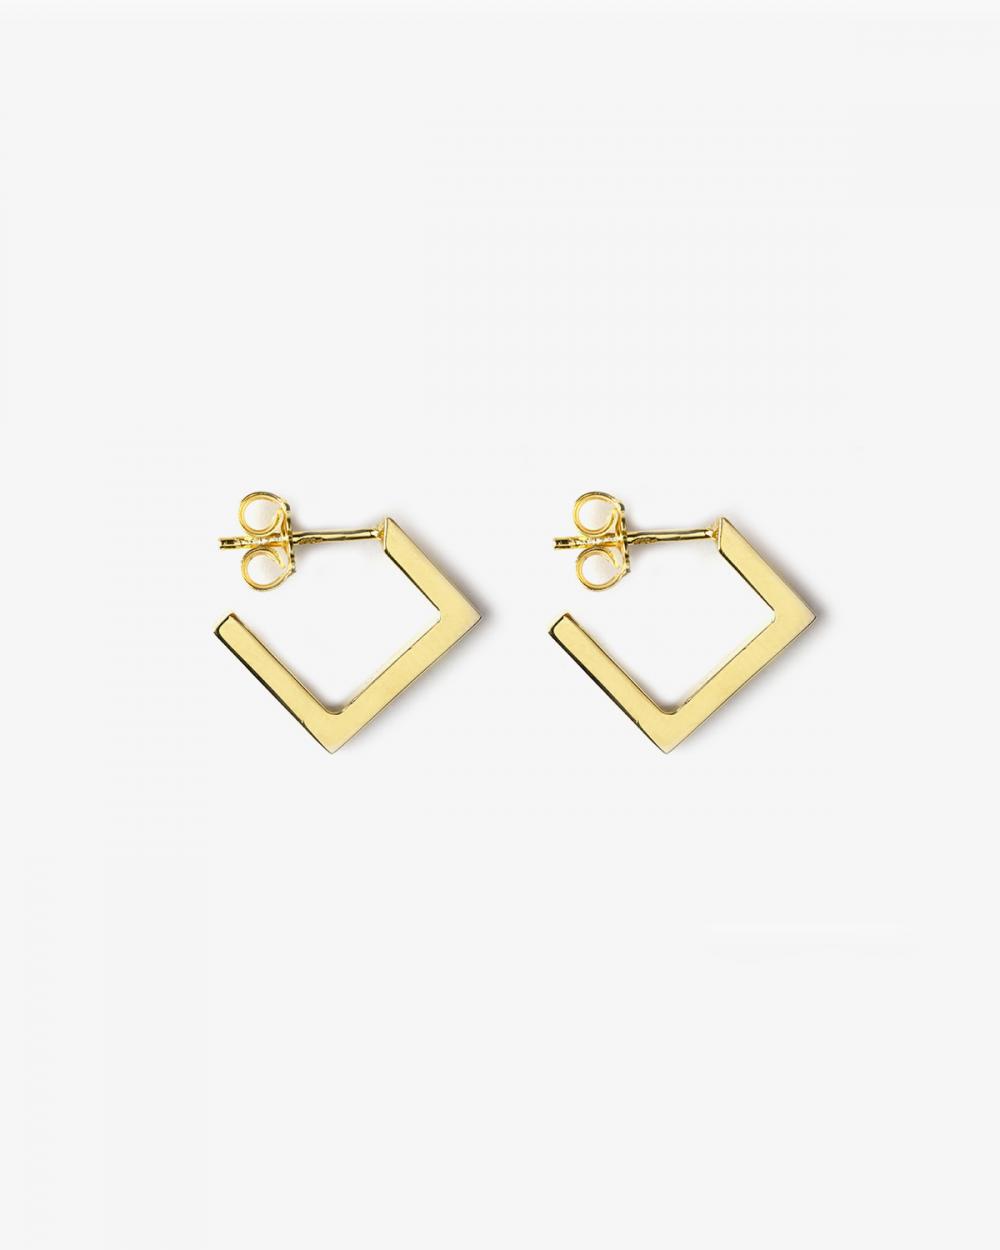 Earrings YELLOW GOLD RHOMBUS PLATE SMALL EARRINGS NOVE25